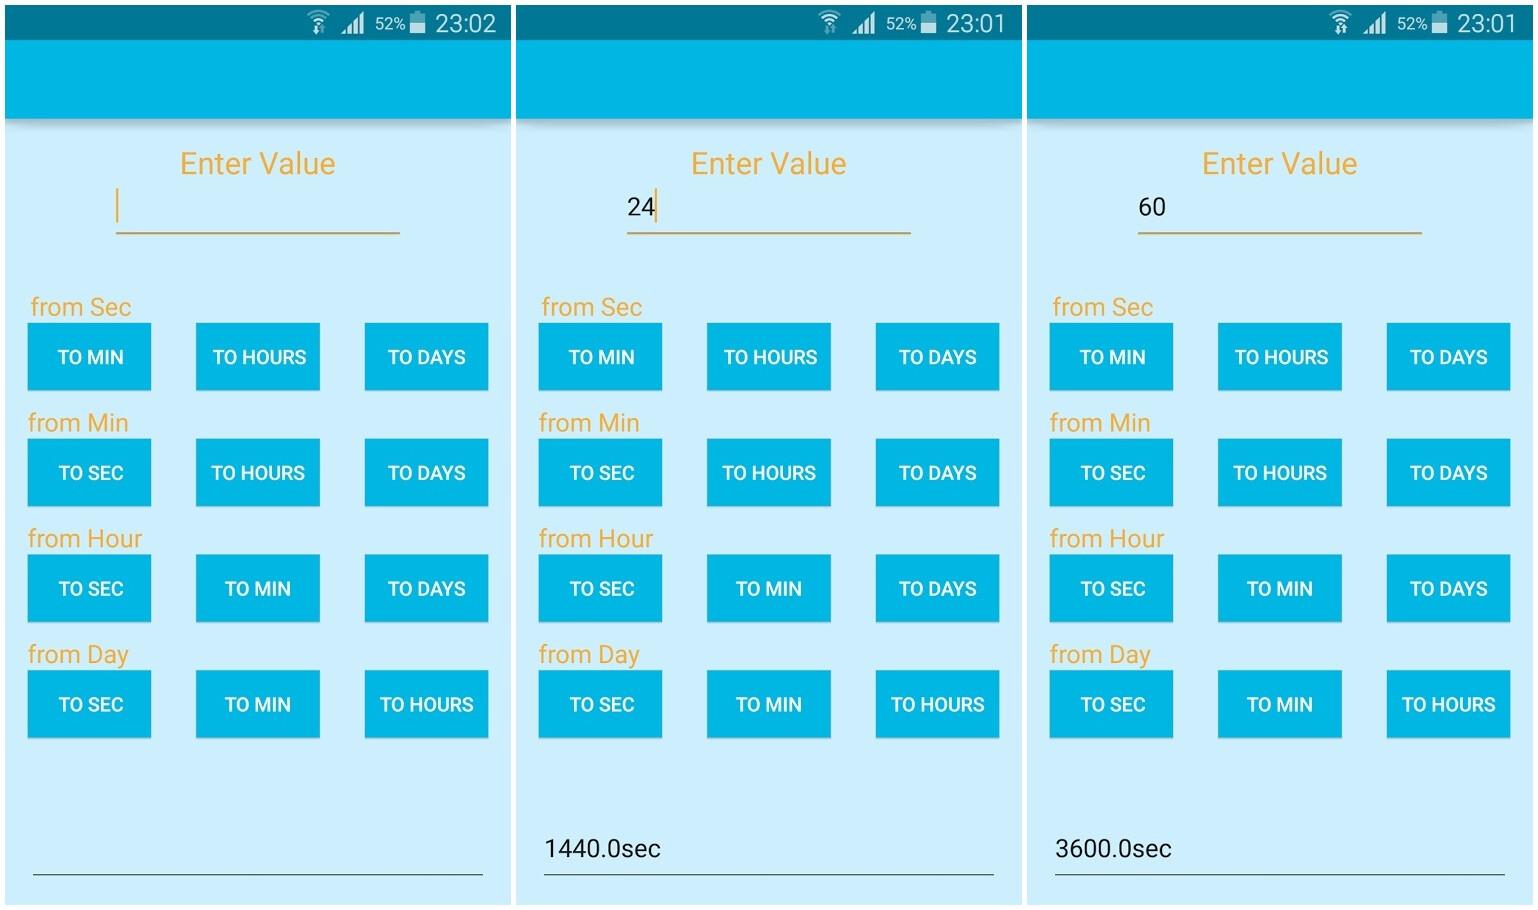 Time Zone converter App for Windows 10 Utc